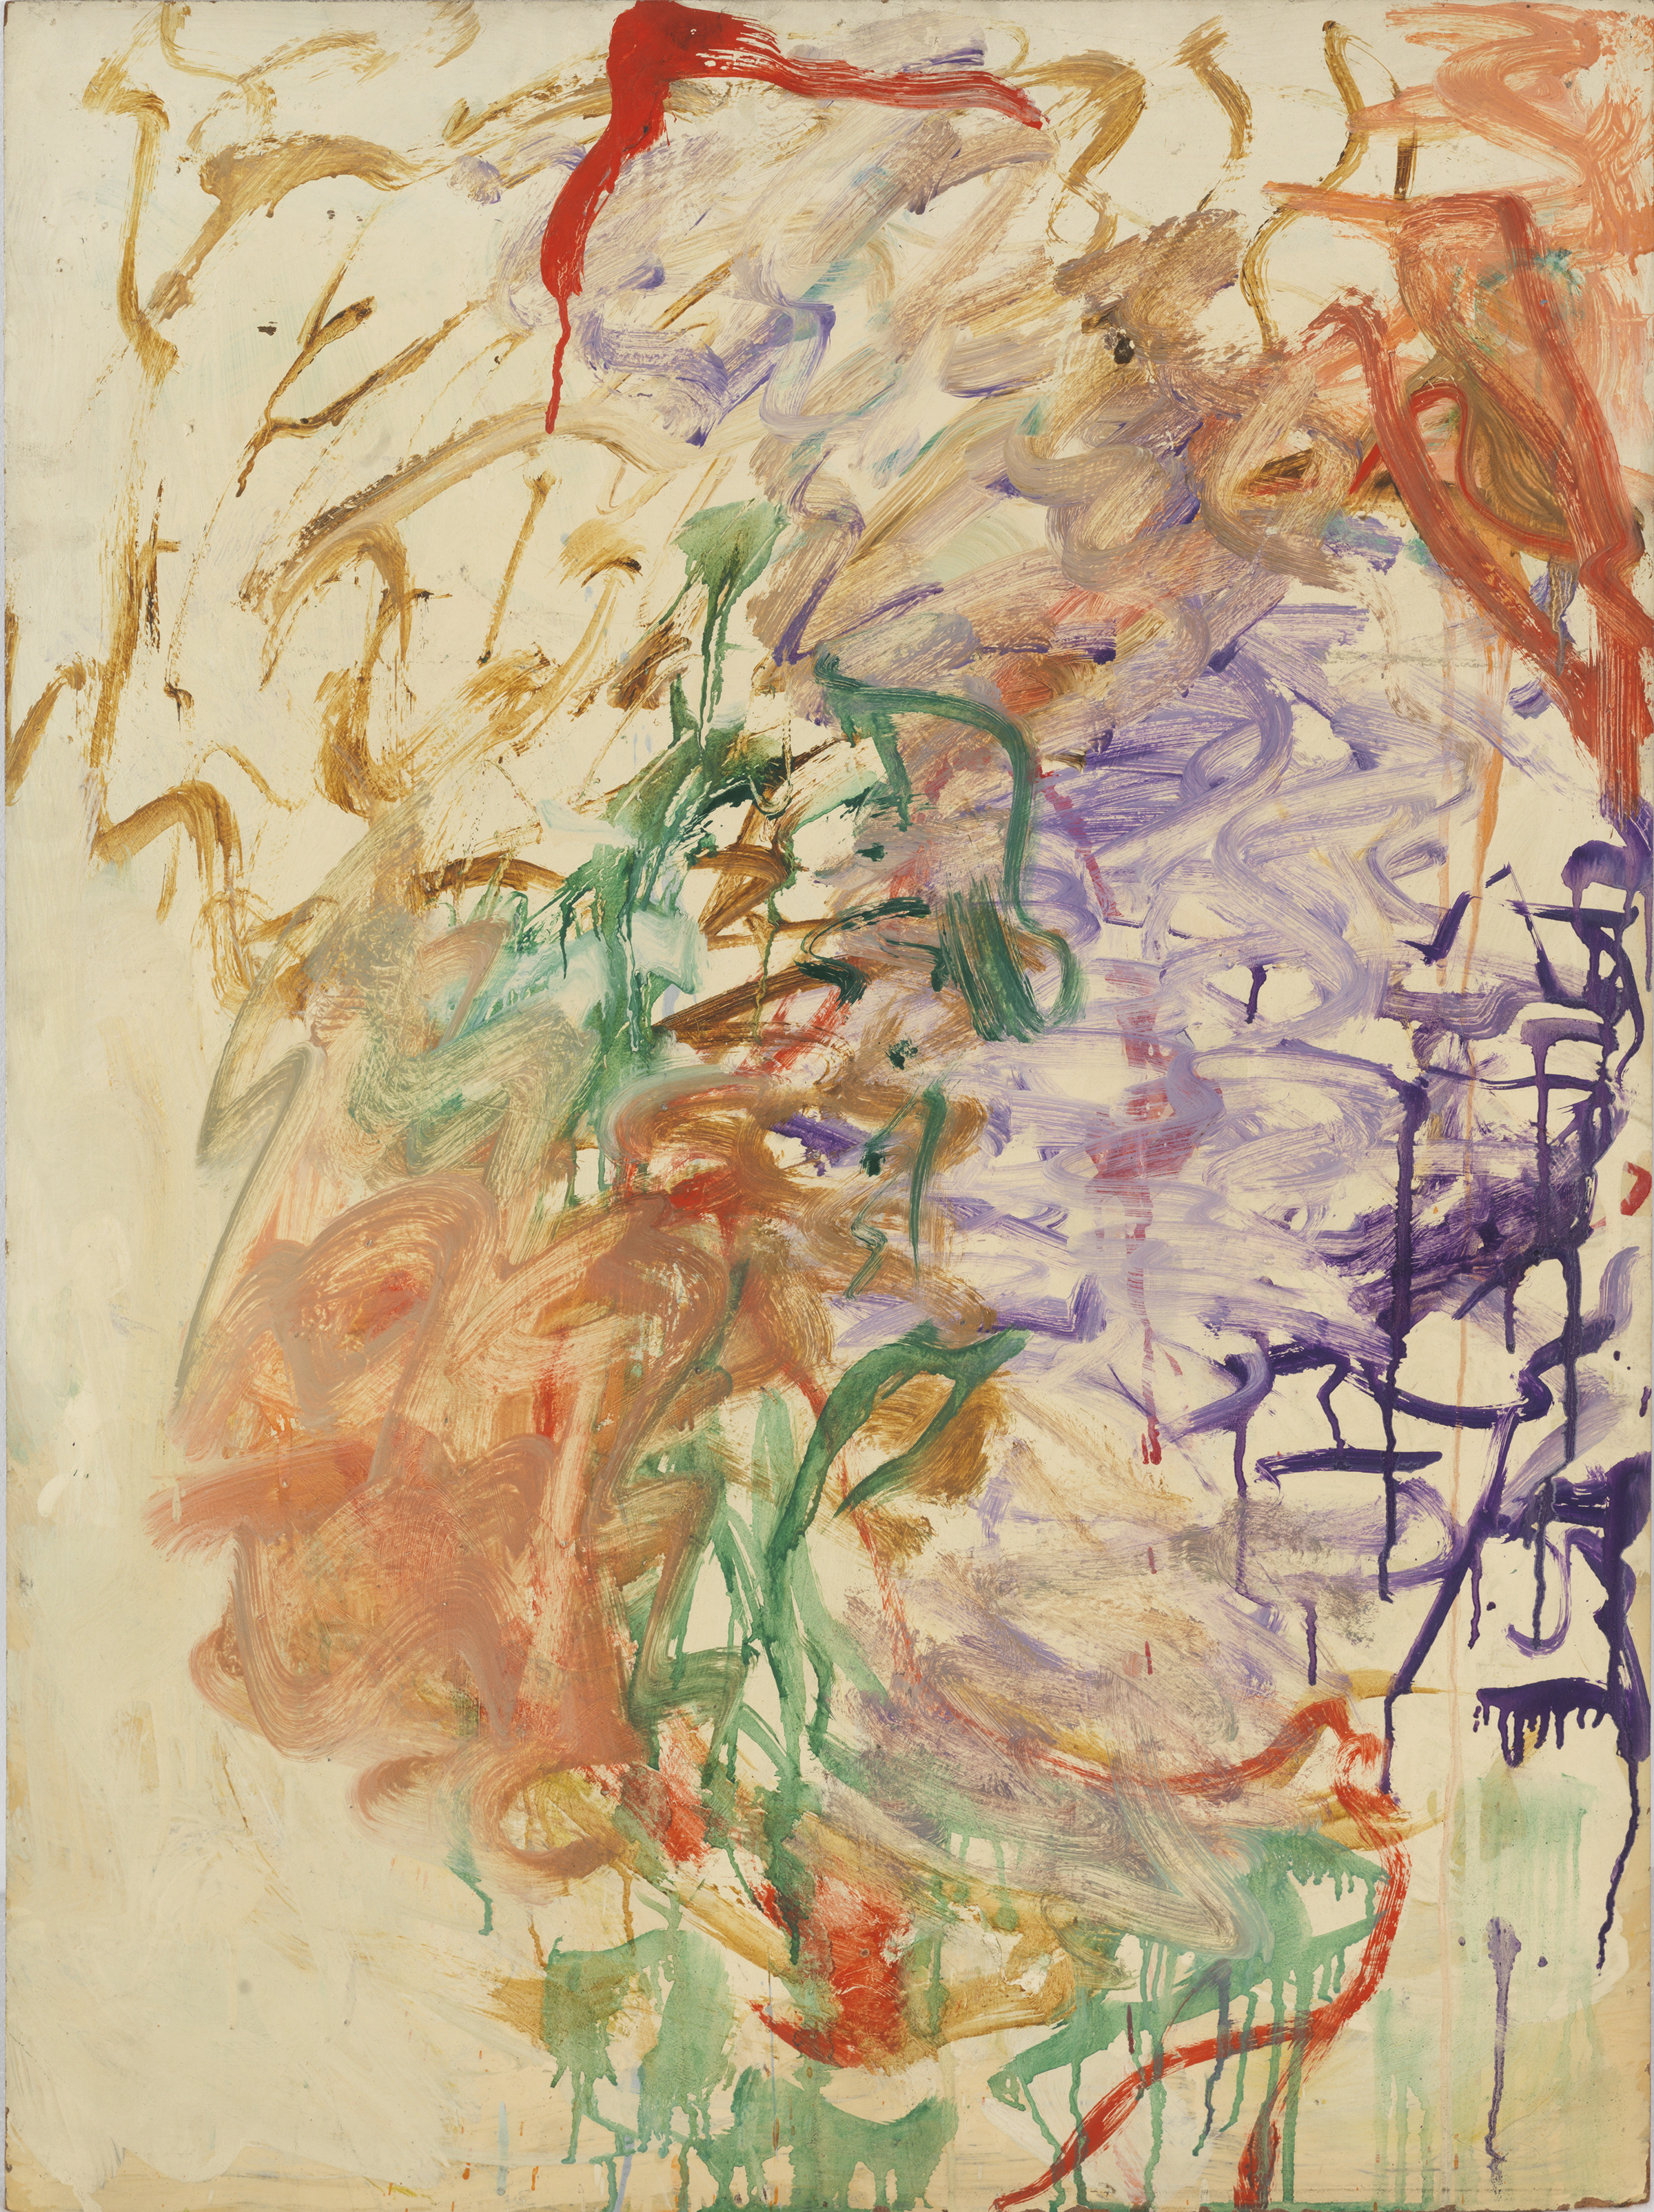 Pat Passlof  Tan , 1960 Oil on linen 24 x 32 inches